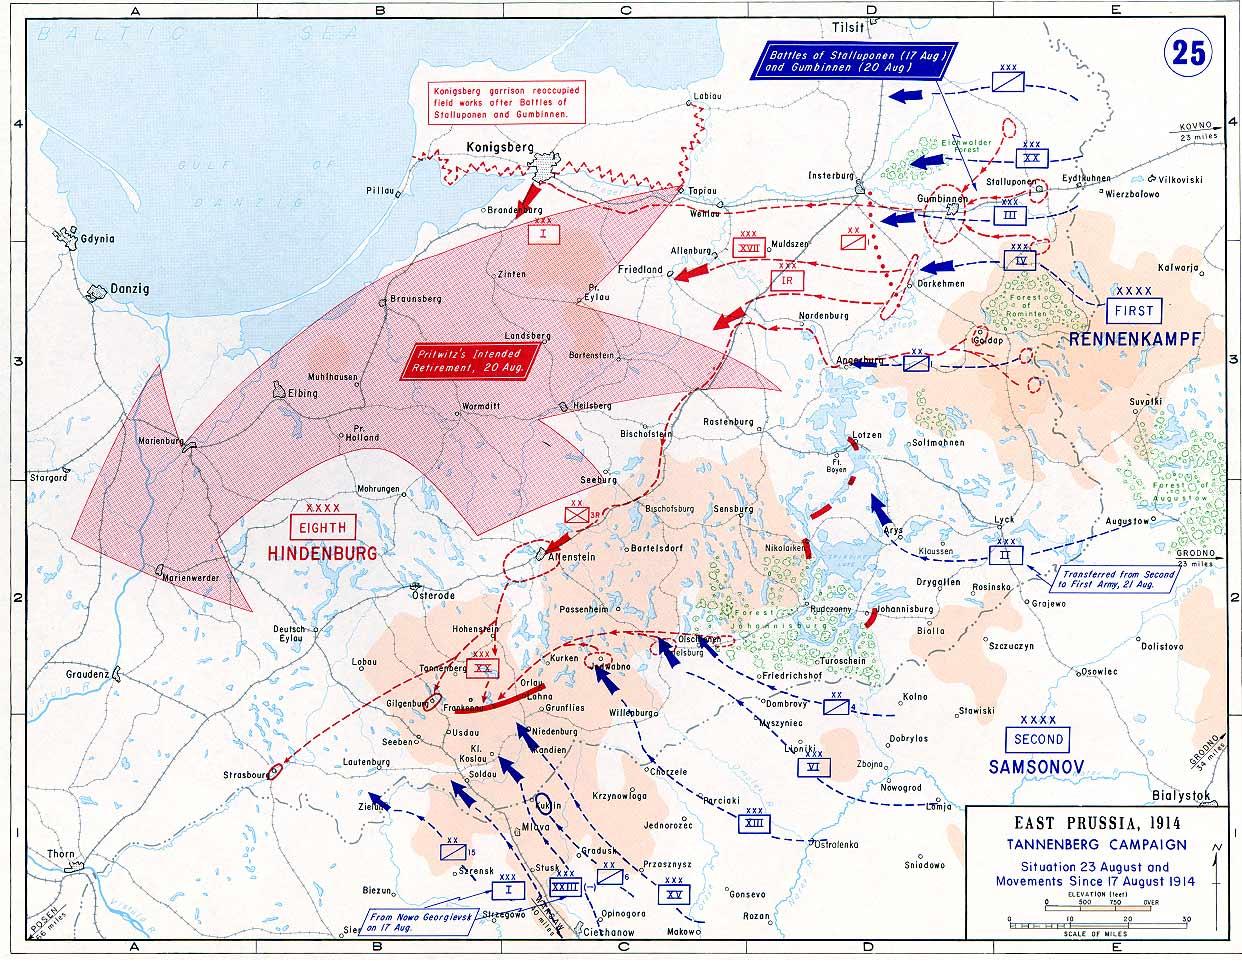 Battle of Tannenberg: 26-30 August 1914